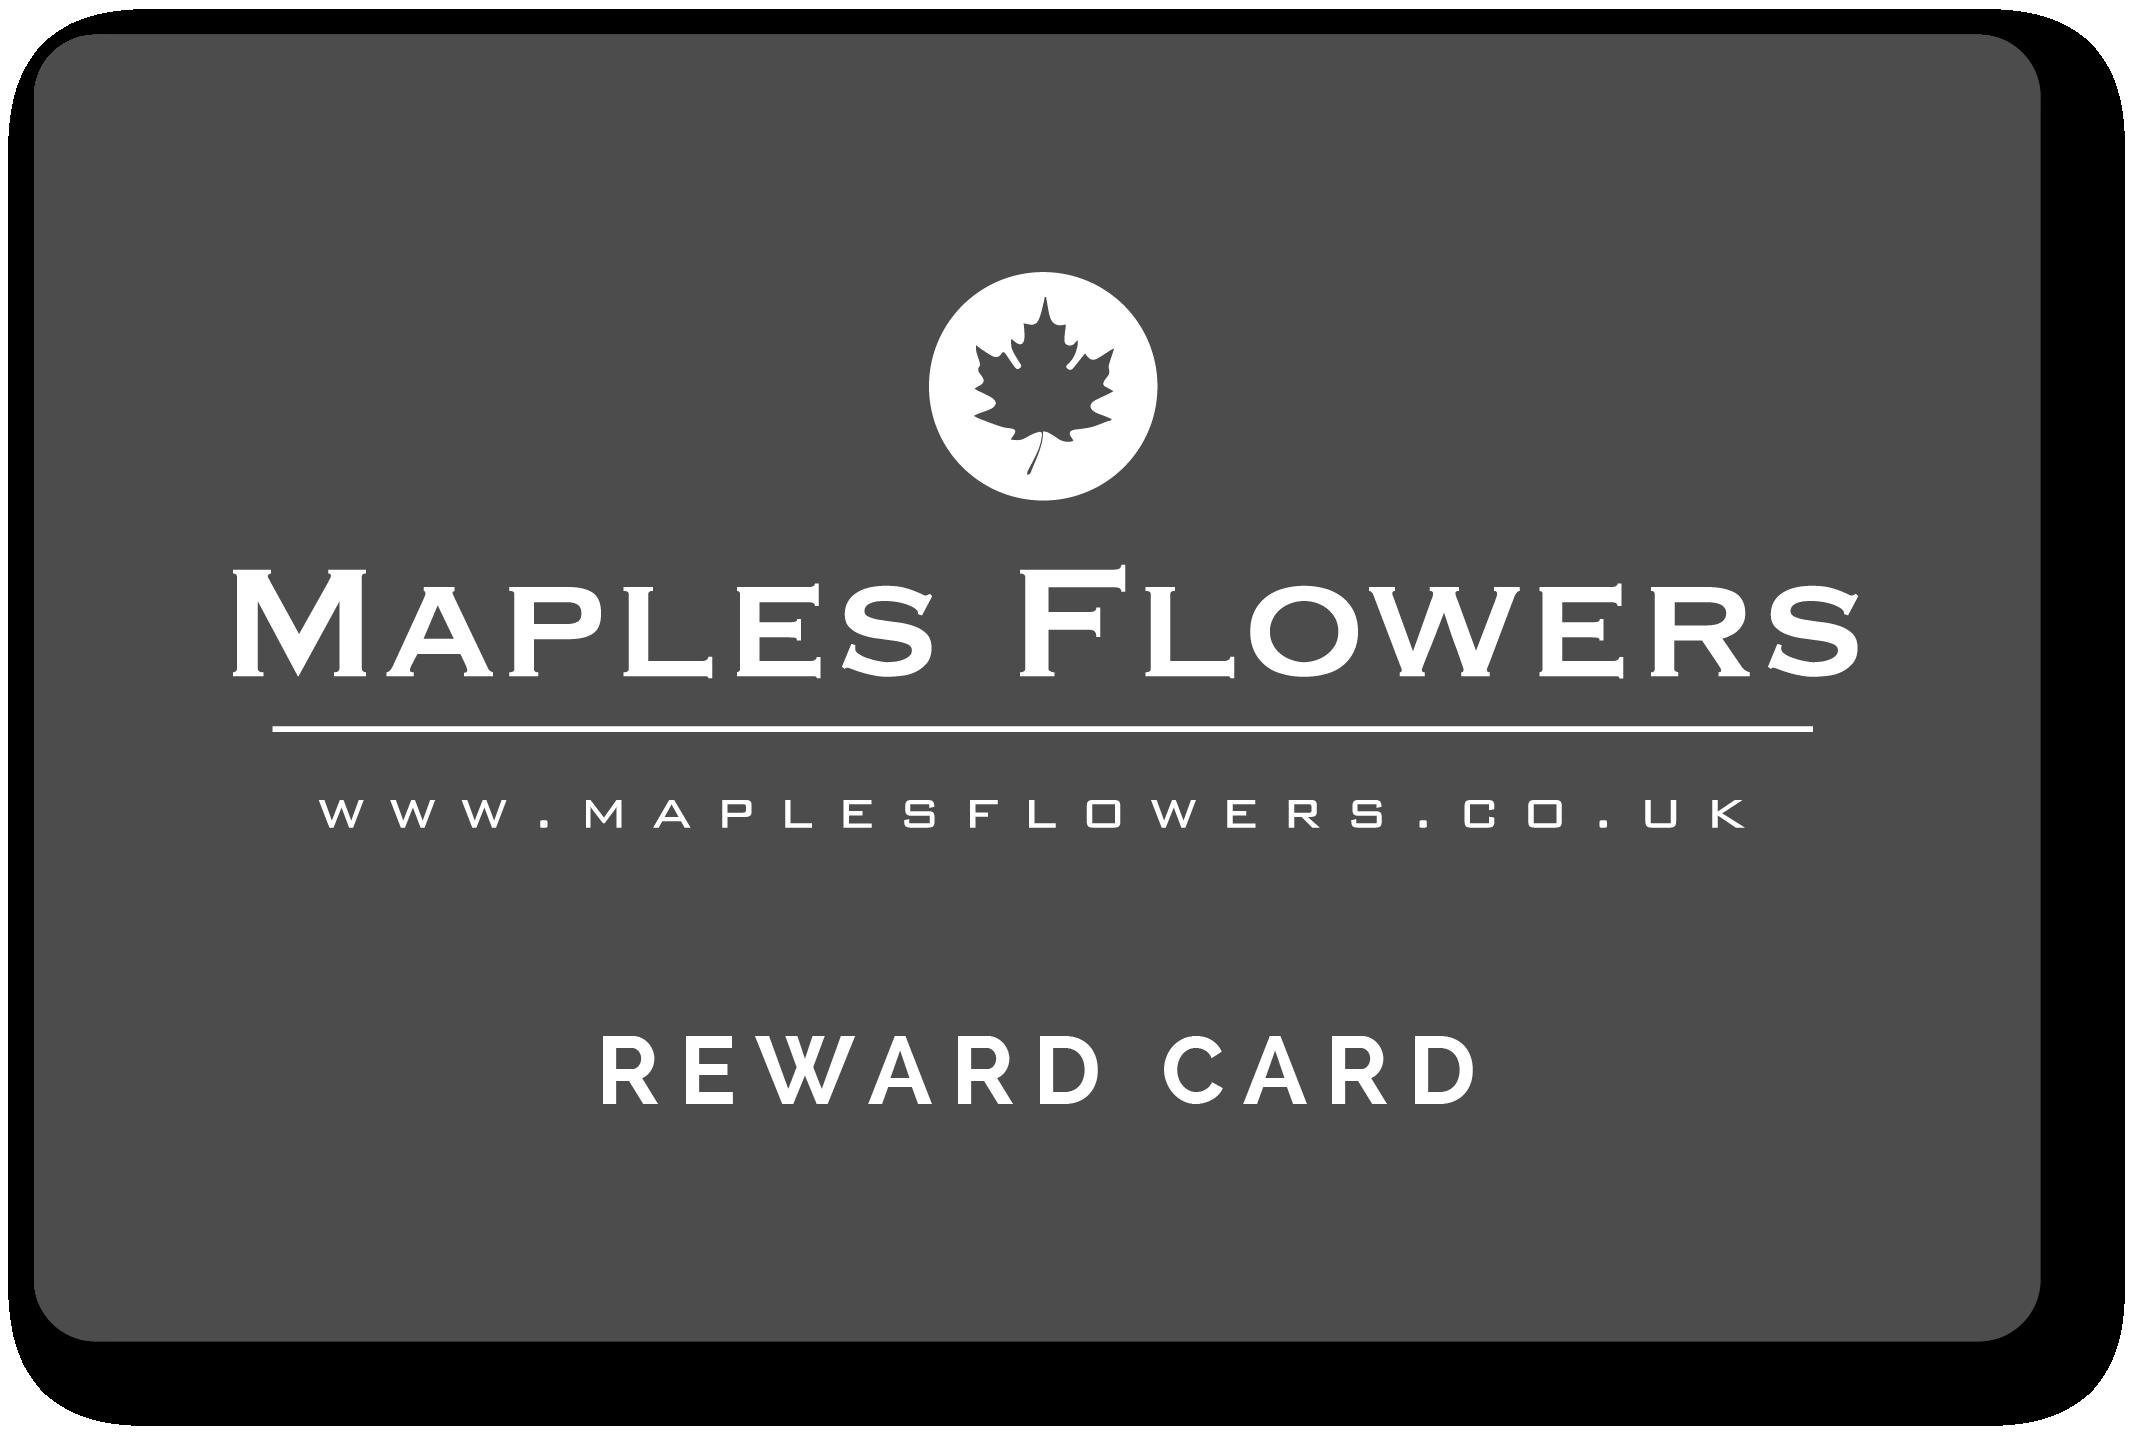 Maples Flowers Reward Card